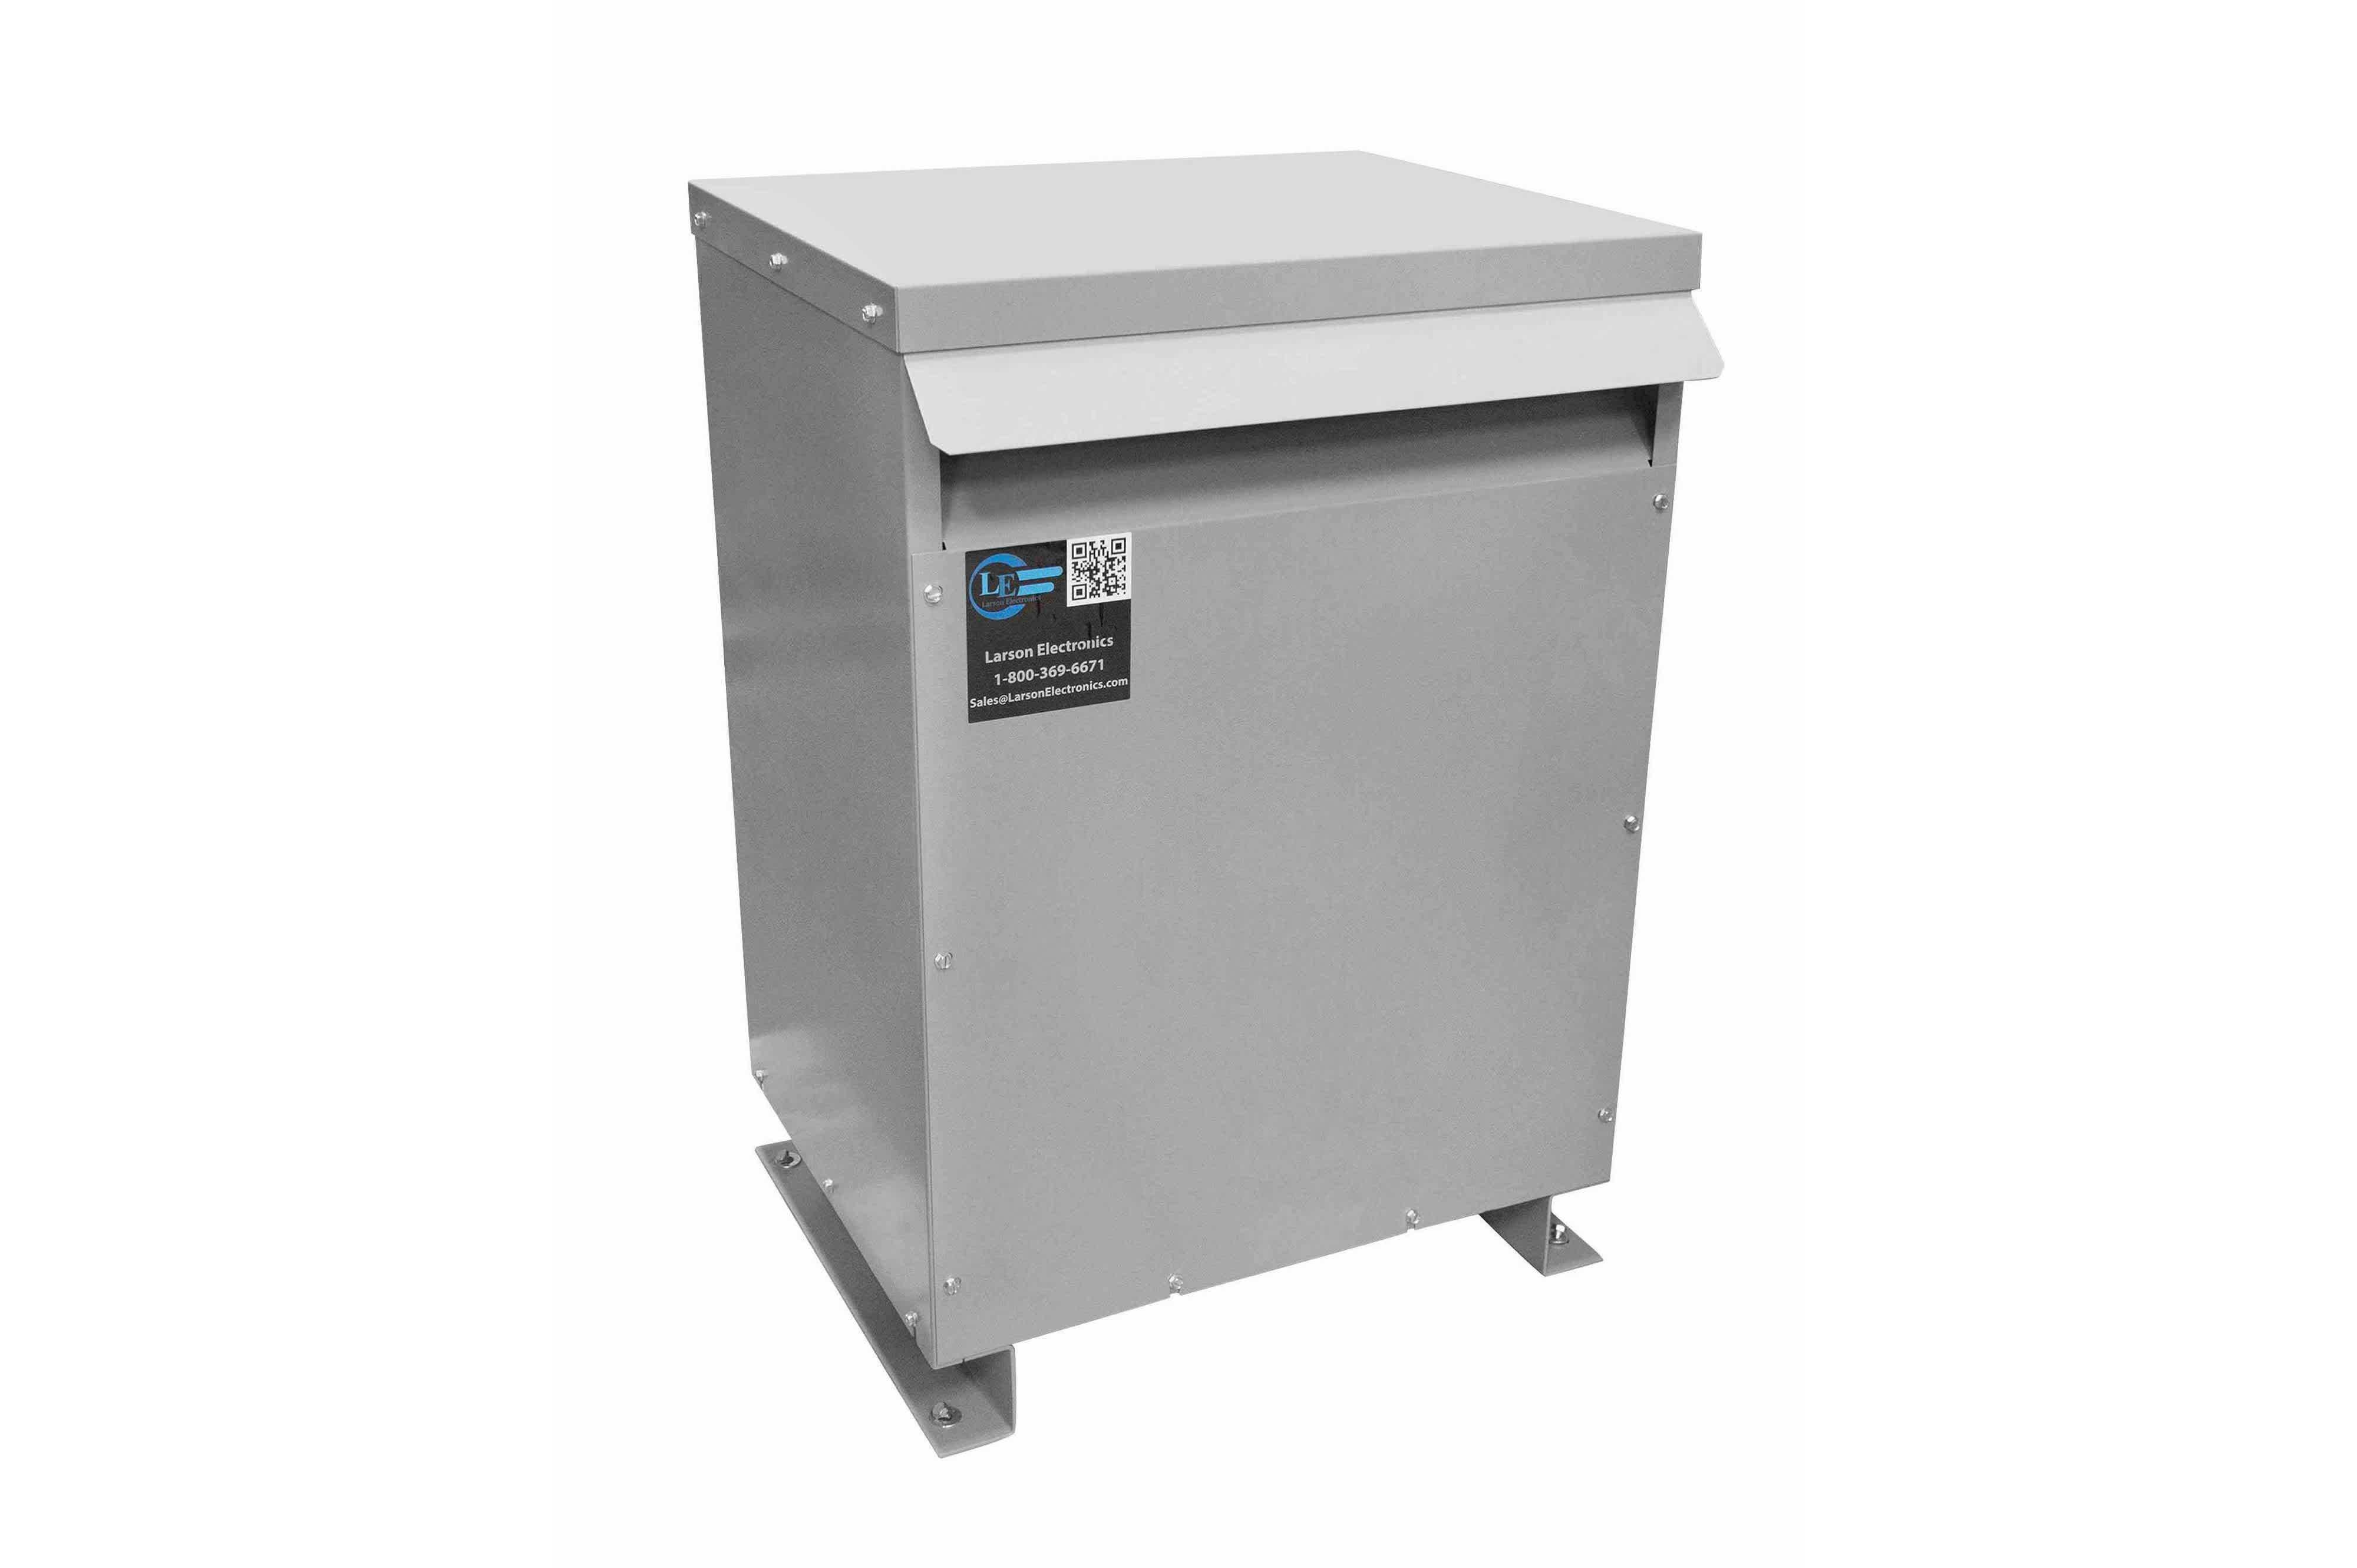 1000 kVA 3PH Isolation Transformer, 480V Wye Primary, 400V Delta Secondary, N3R, Ventilated, 60 Hz